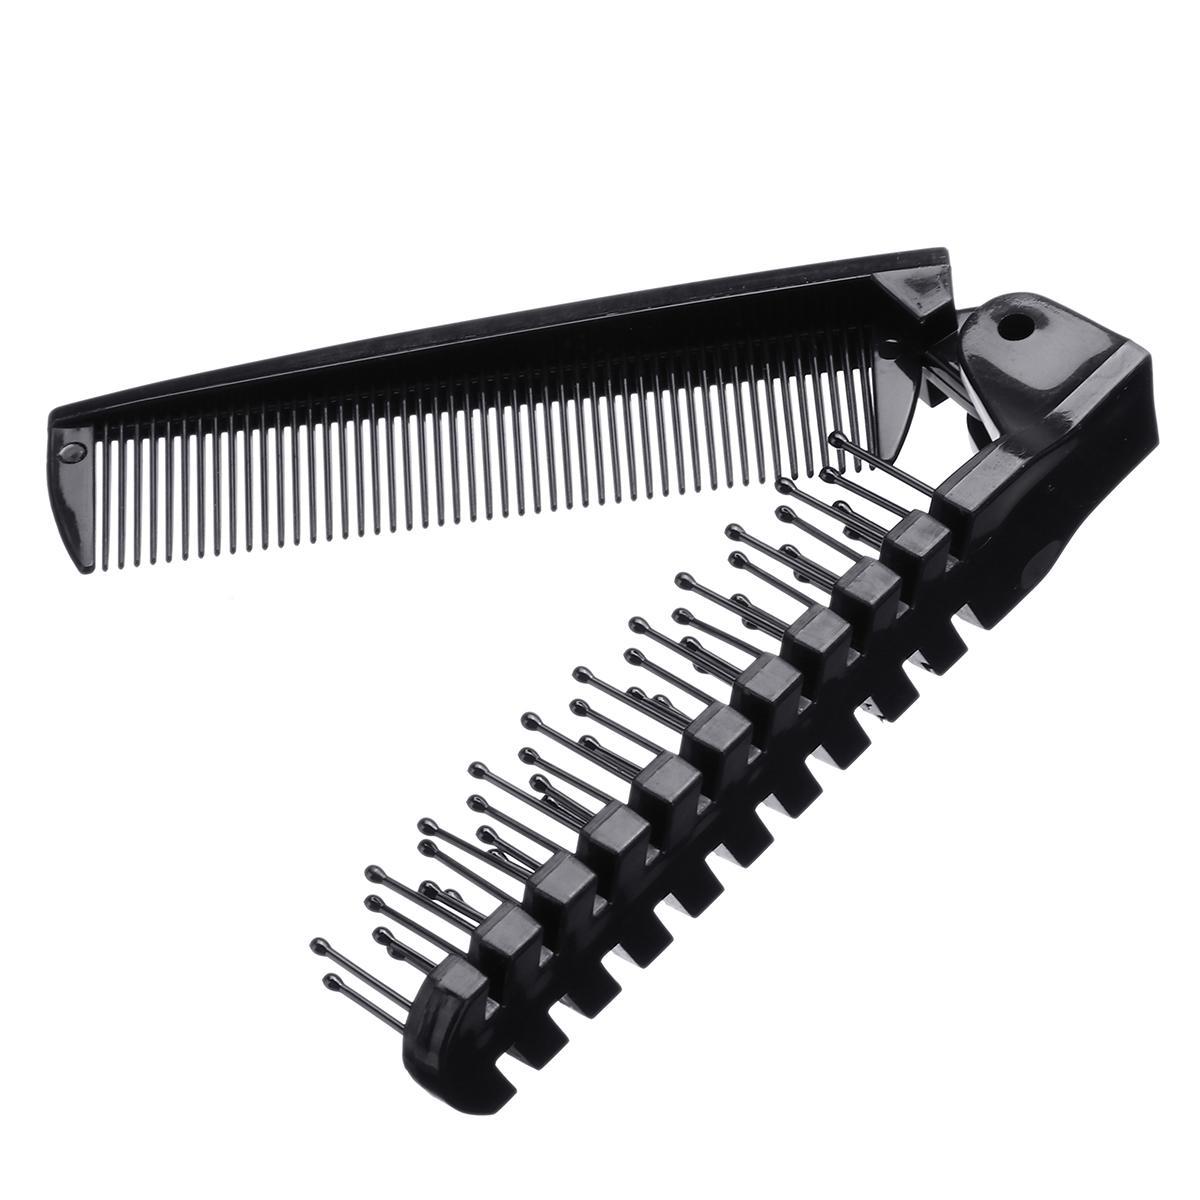 1 Pcs Folding Comb Men Women Beauty Handmade Portable  Folding Bag Clip Anti-Static Hair Moustache Beard Comb Hairdressing Tools